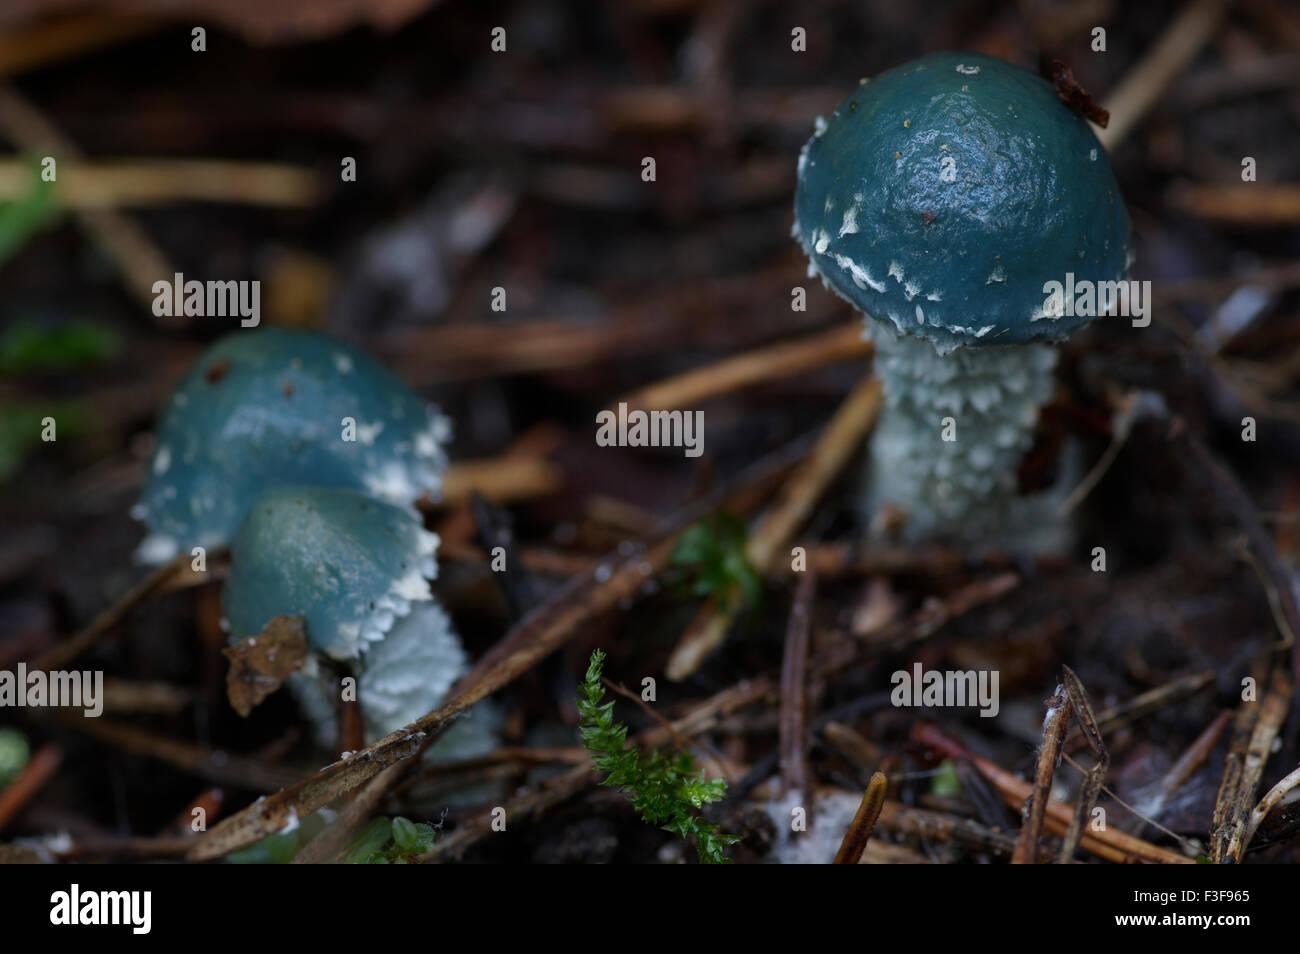 Stropharia caerulea blue-green fungi, Estonia, 06th October, 2015 - Stock Image